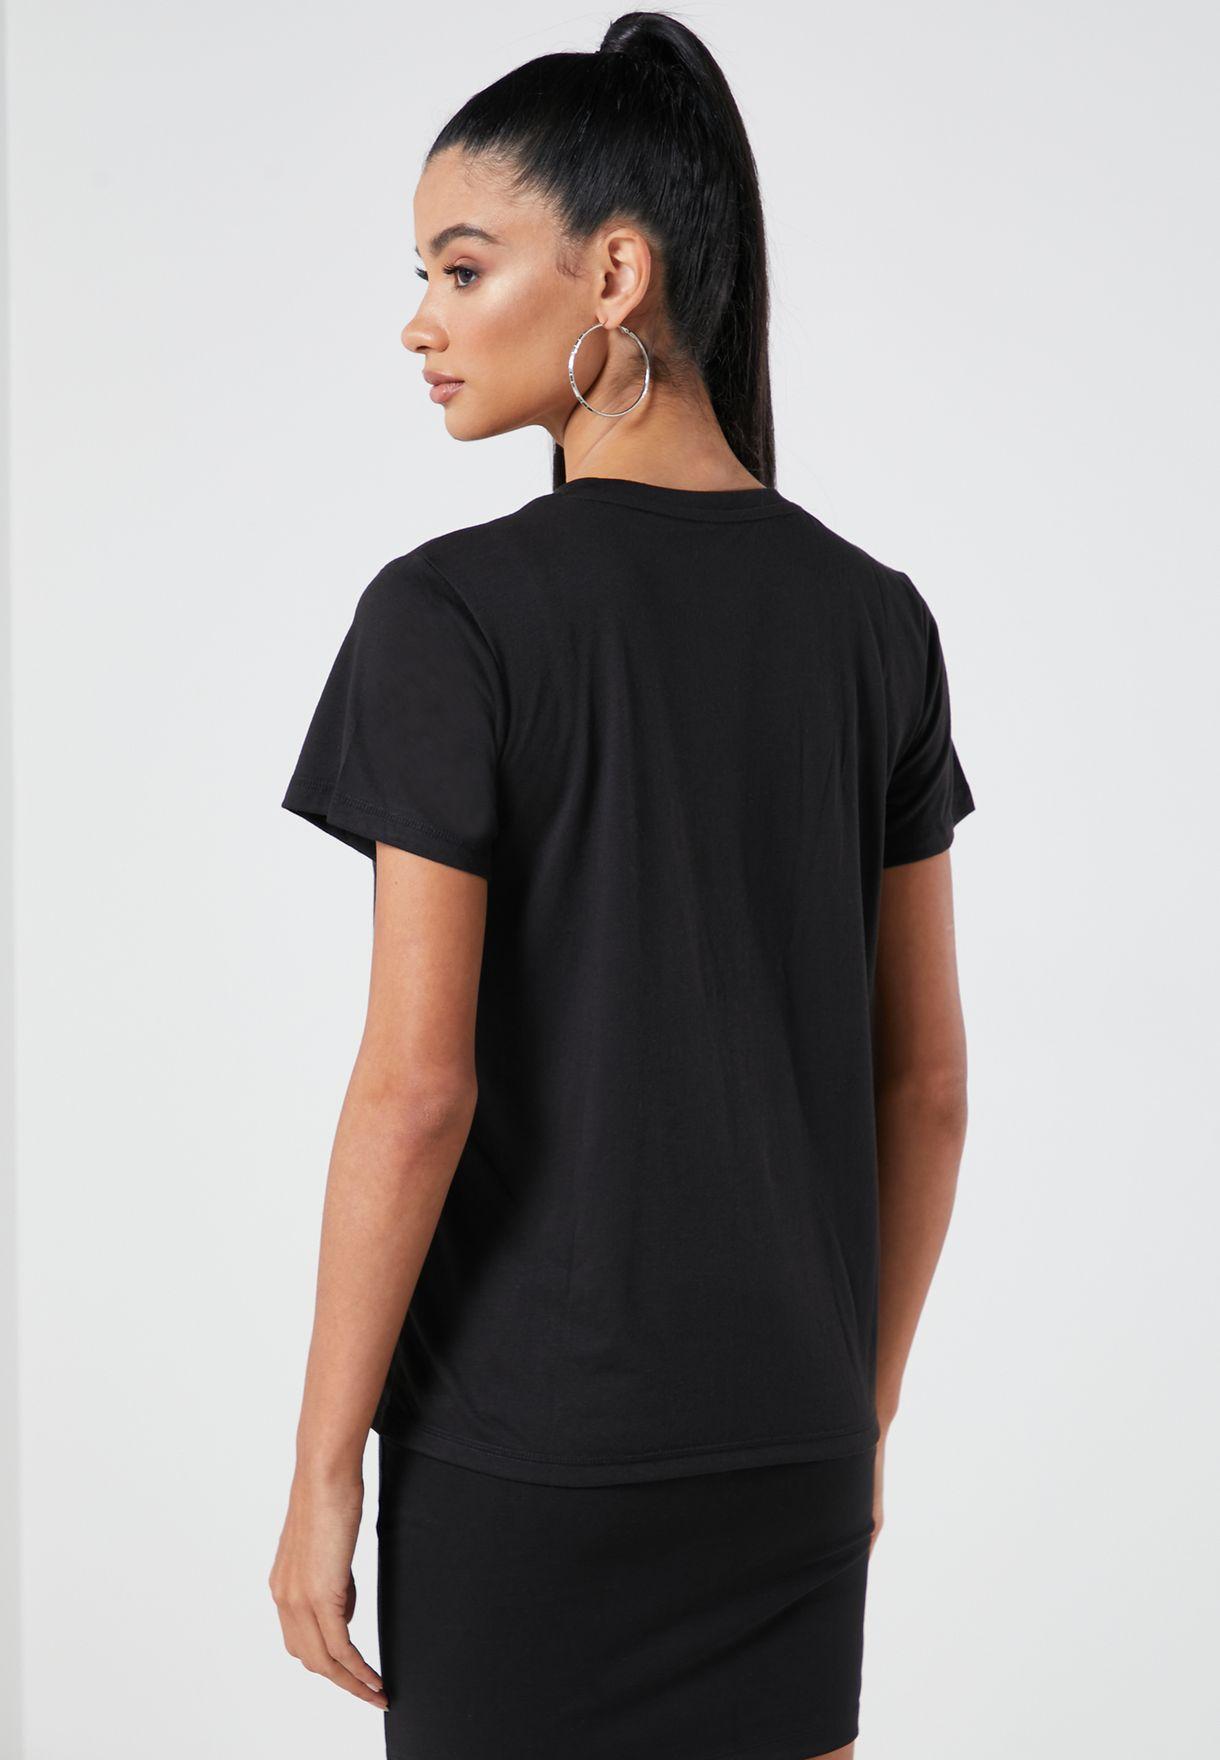 Evostripe women t-shirt